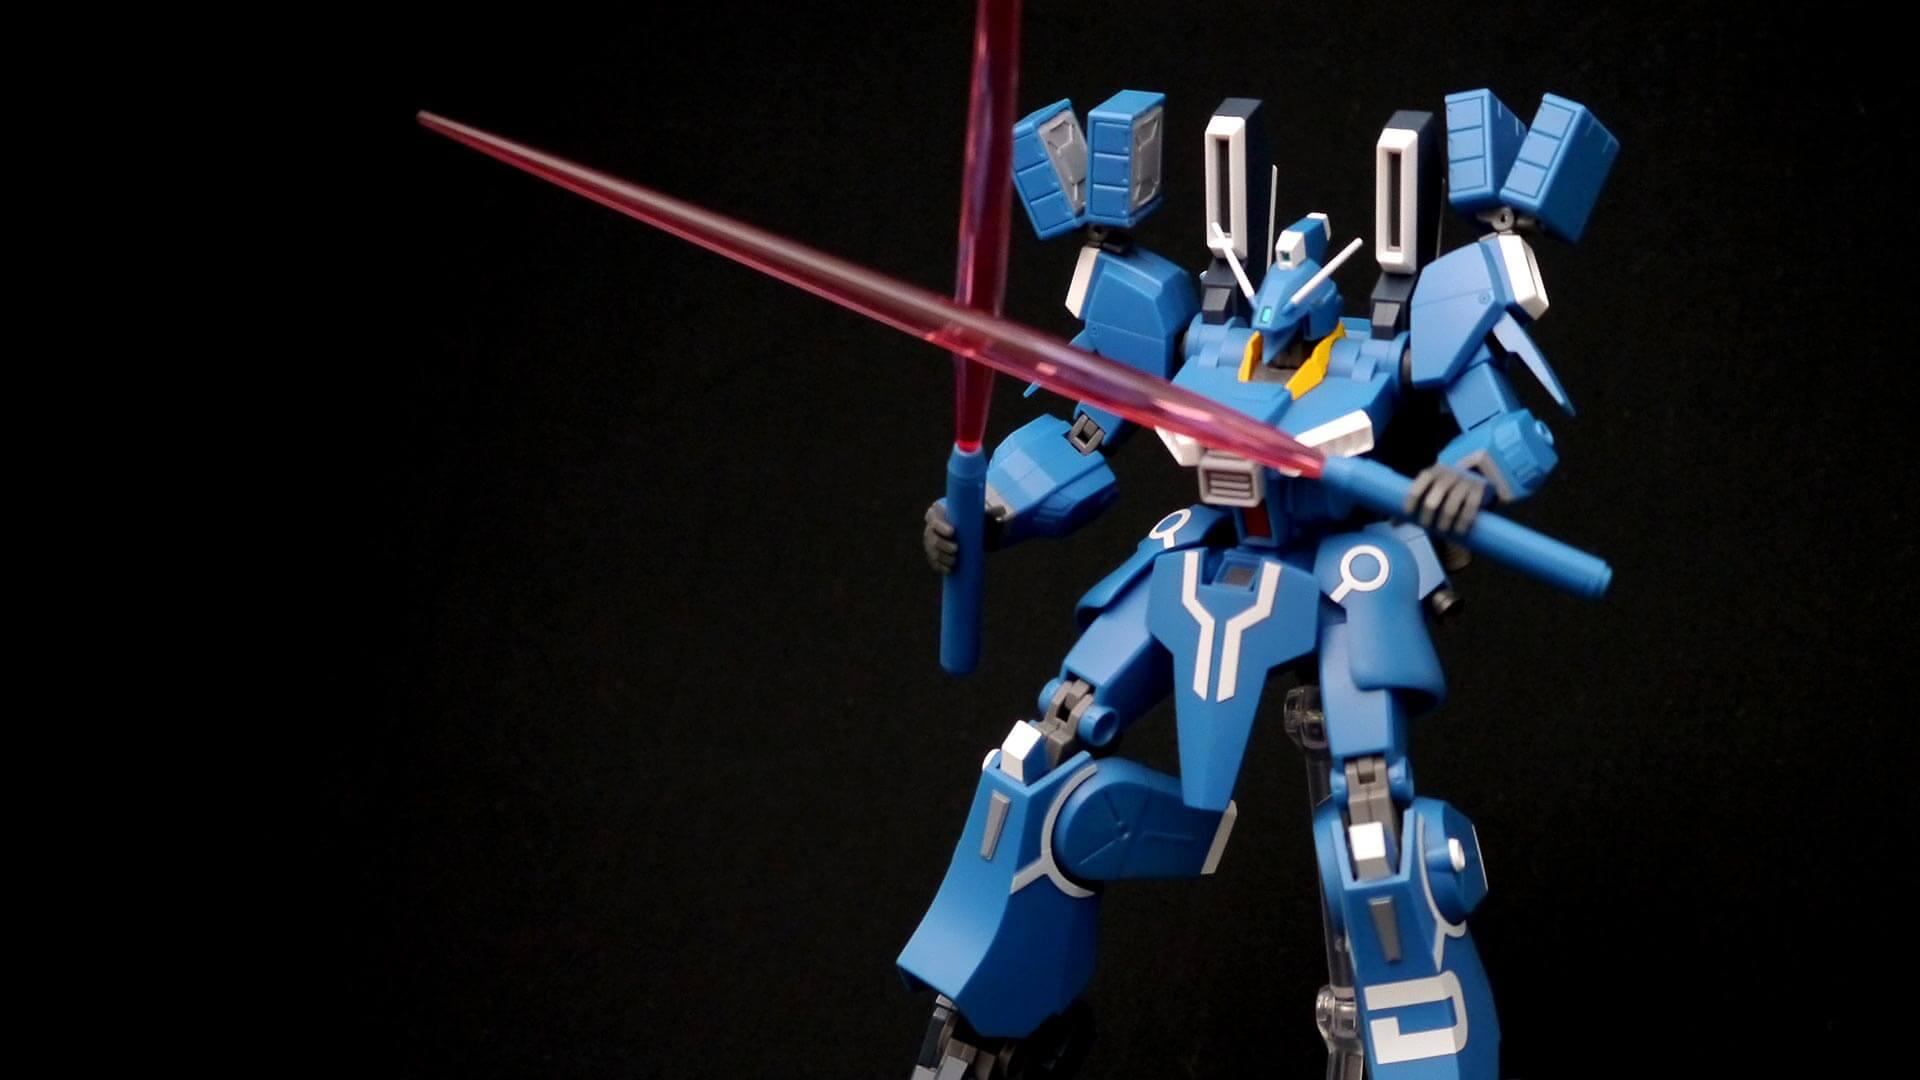 ROBOT魂 ガンダムMk-V ビームサーベル2刀流